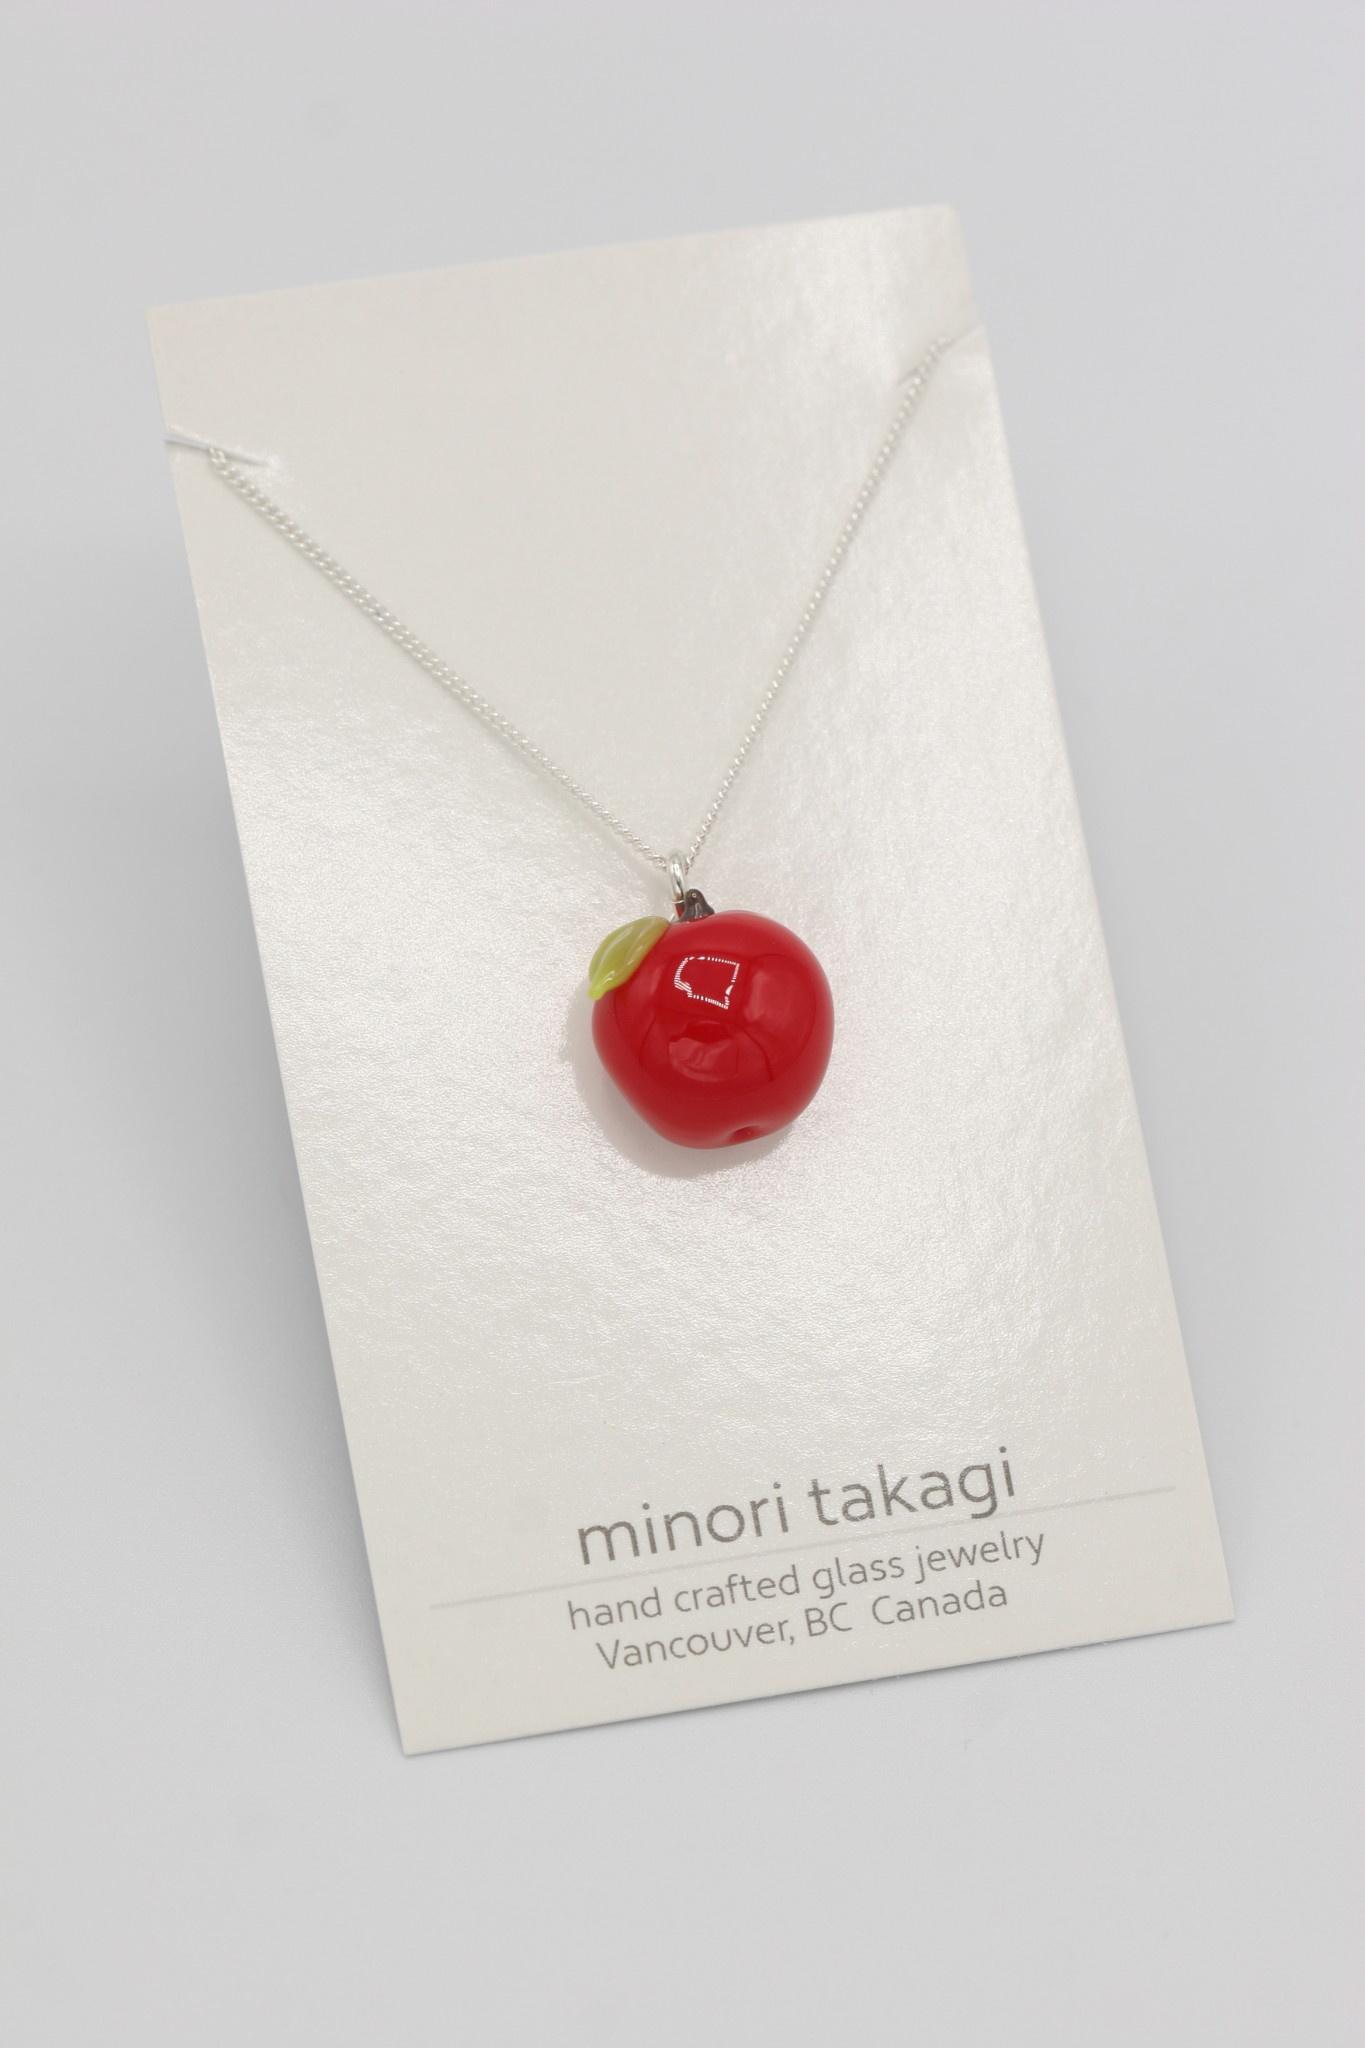 Minori Takagi Necklace - Red Apple